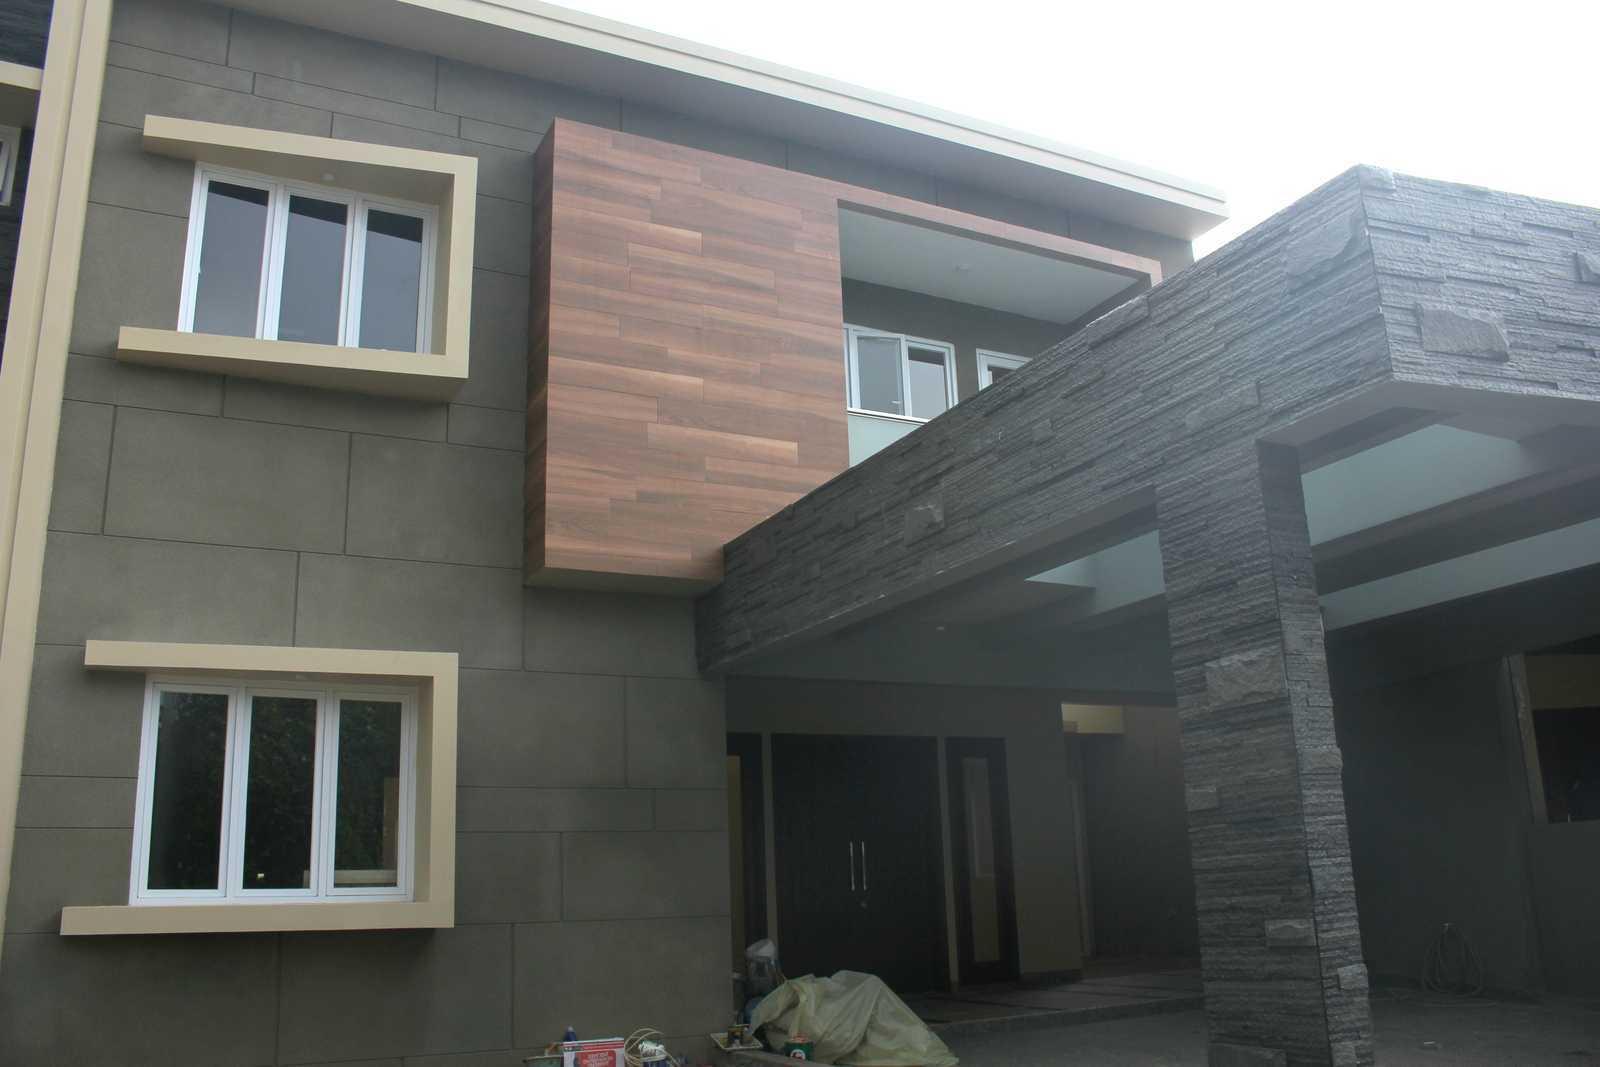 X3M Architects Beringin Golf Residence Jl. Cendana Golf No.2, Bencongan, Klp. Dua, Tangerang, Banten 15810, Indonesia Jl. Cendana Golf No.2, Bencongan, Klp. Dua, Tangerang, Banten 15810, Indonesia Img3144   34167